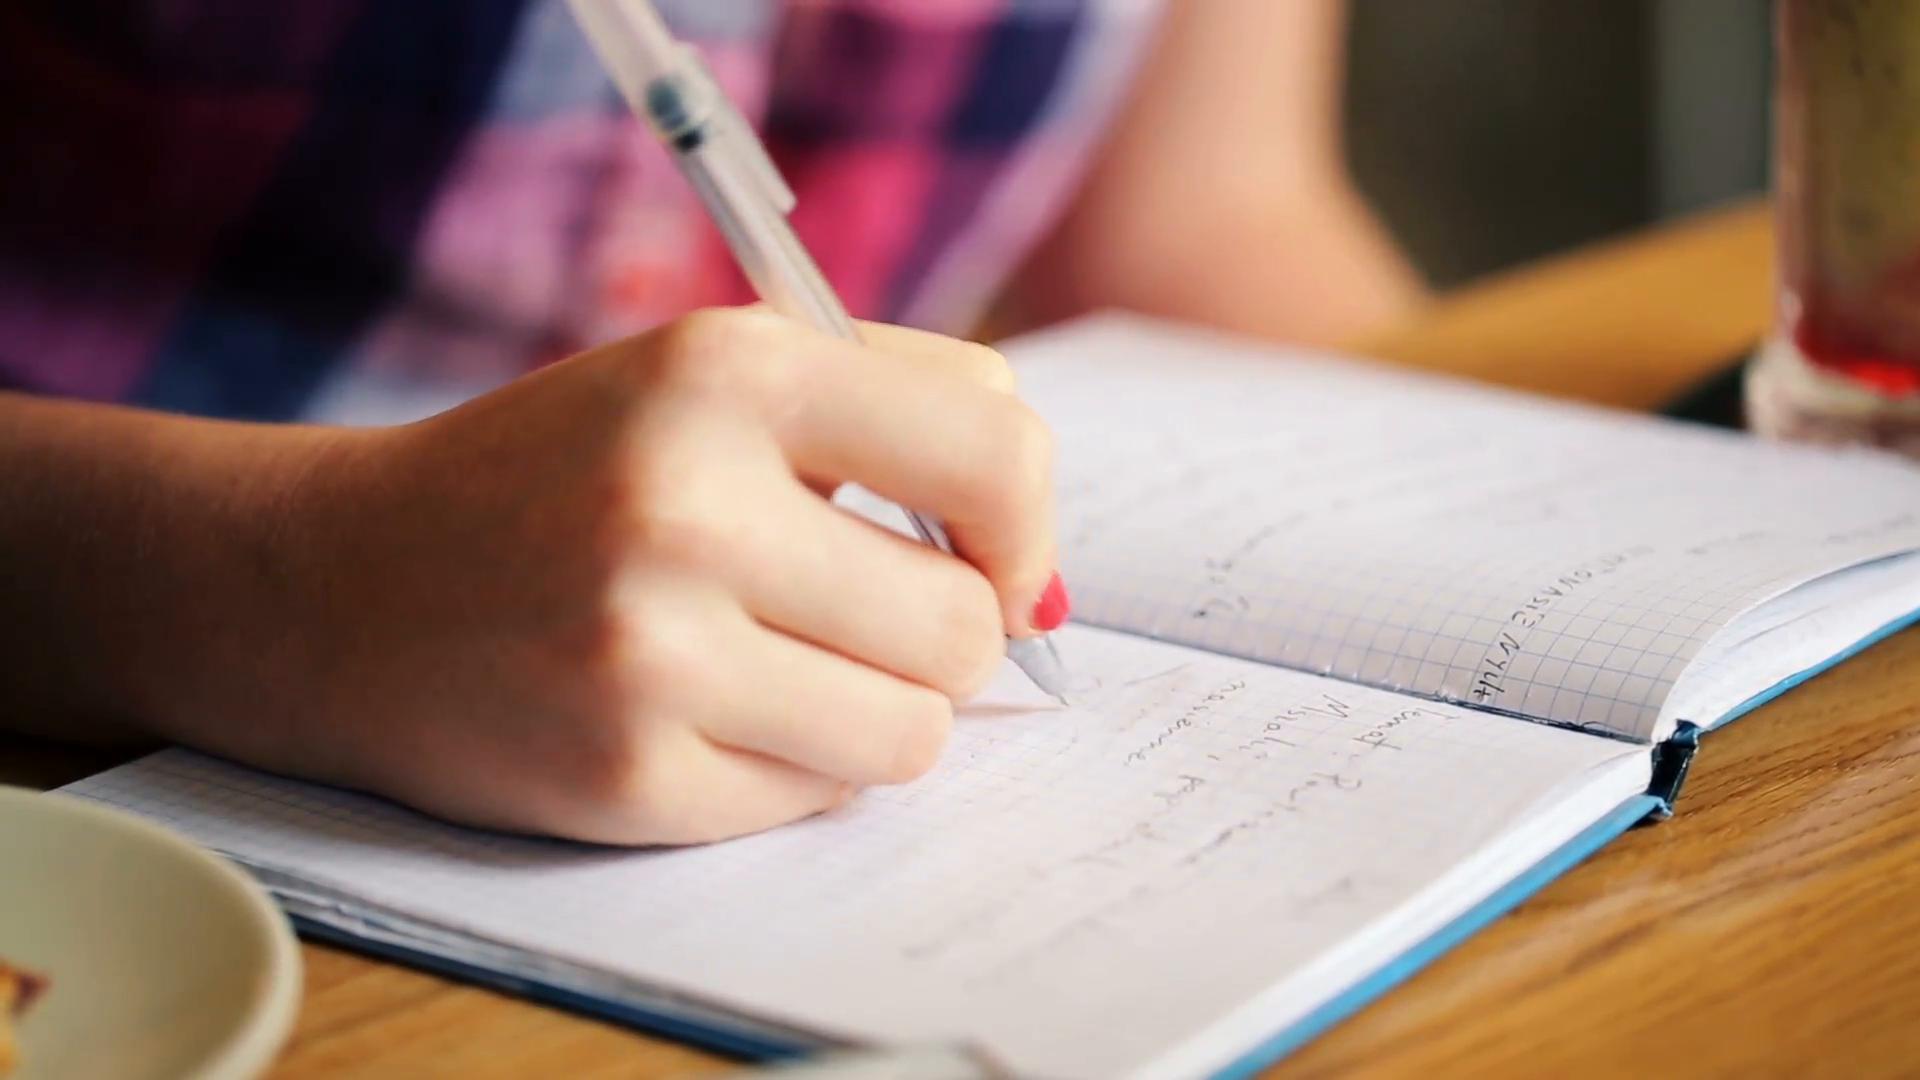 Community service tutoring essay